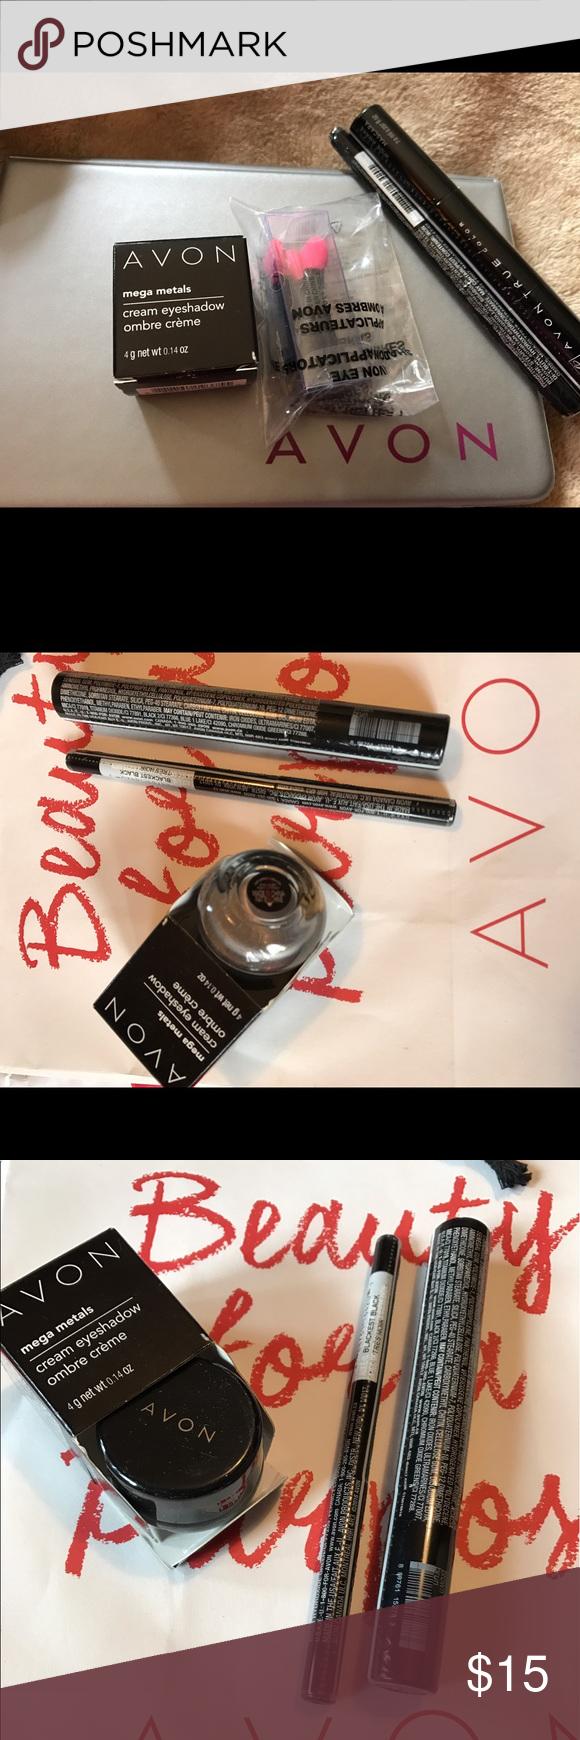 Avon beauty products Avon beauty, Cream eyeshadow, How